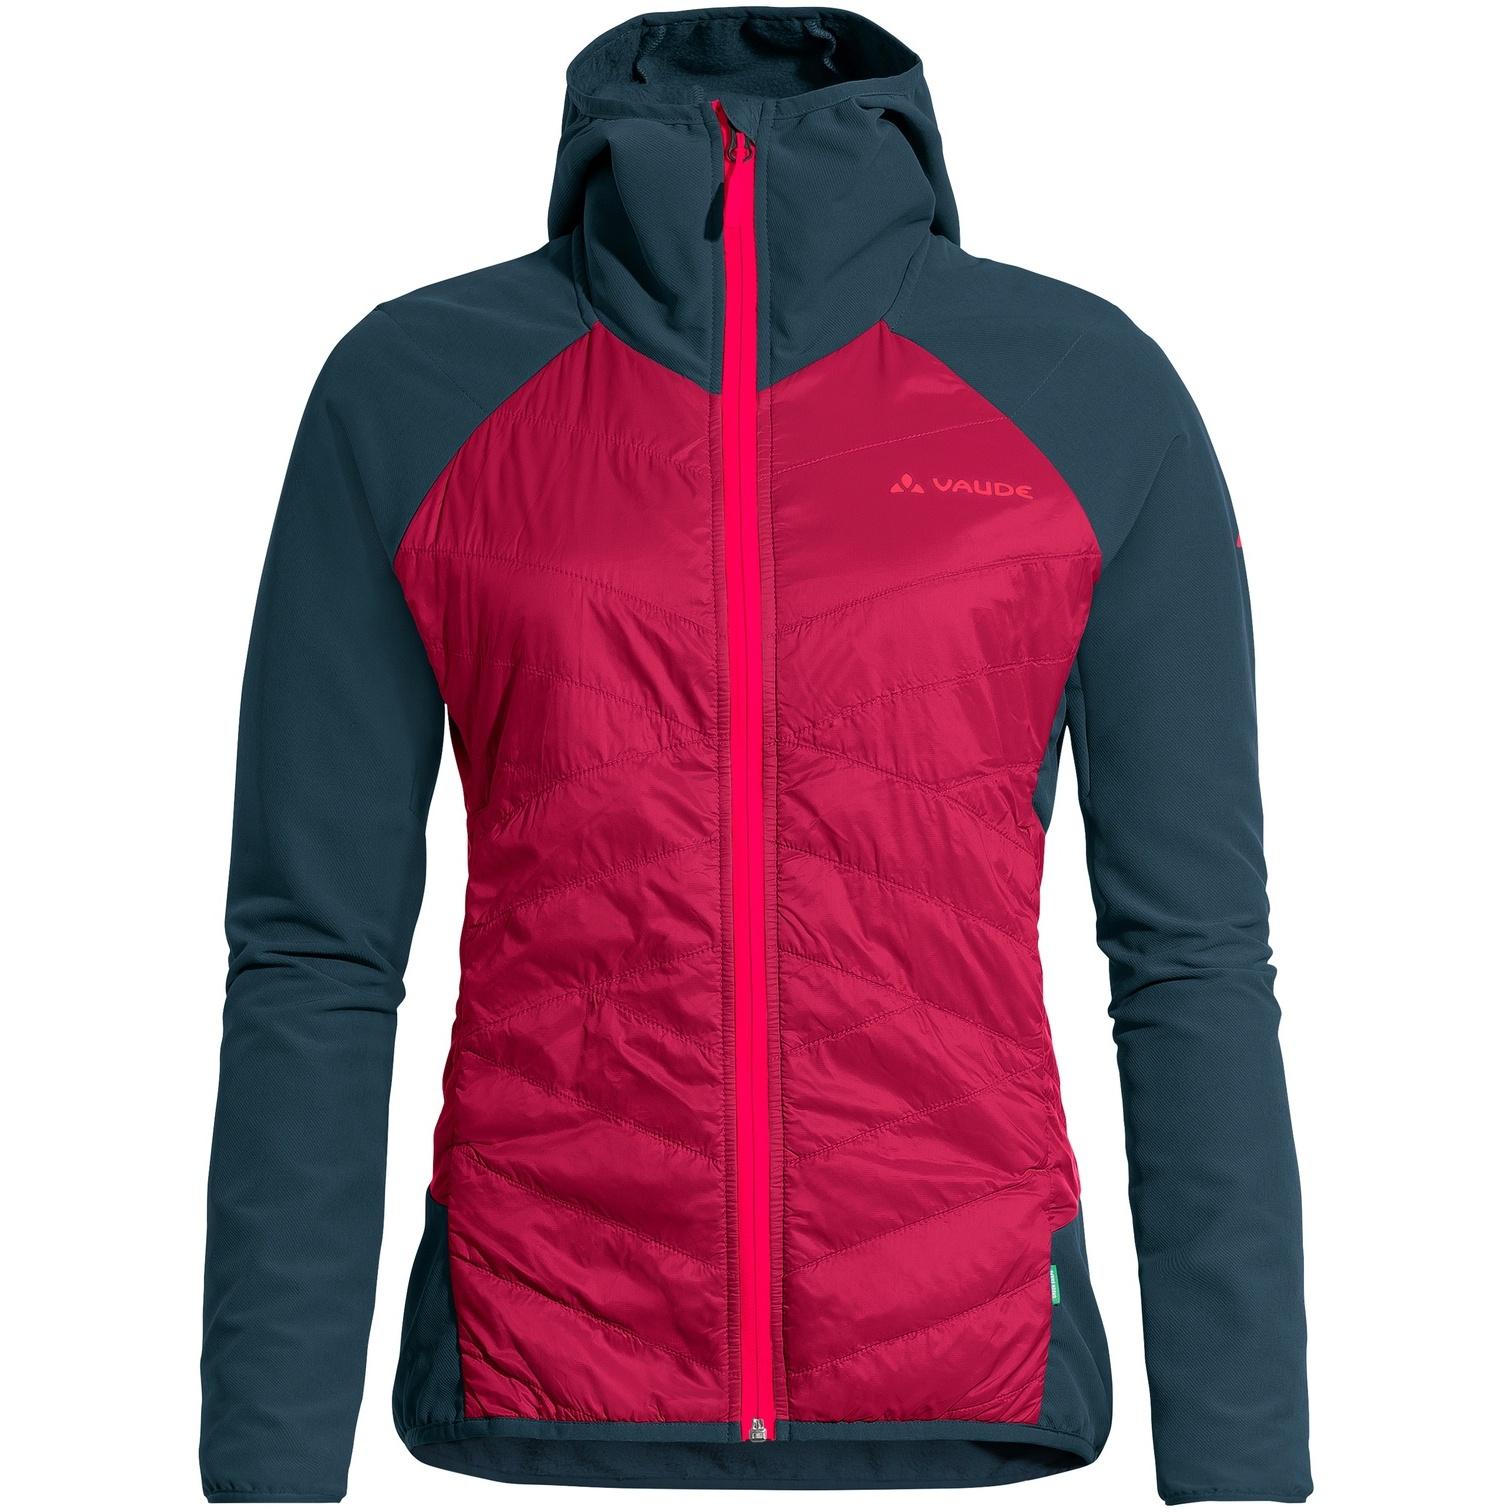 Vaude Women's Valdassa Hybrid Jacket - crimson red